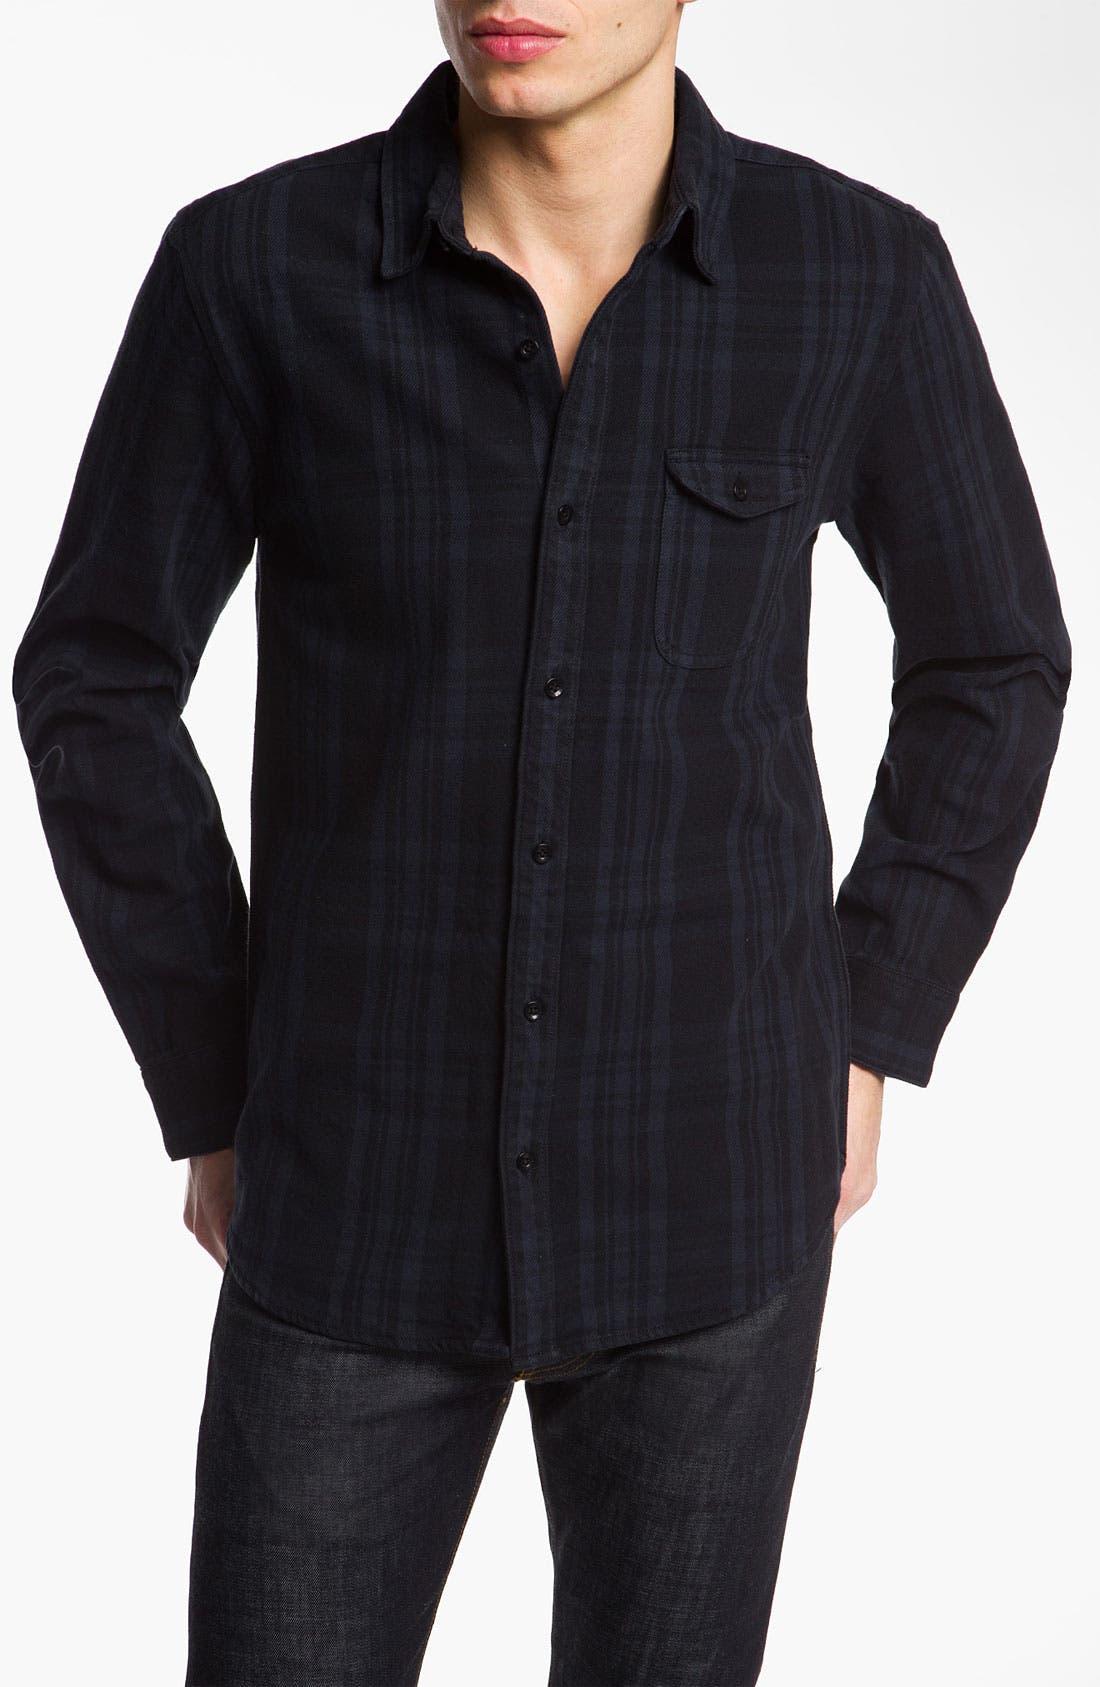 Alternate Image 1 Selected - VSTR 'Jackson' Plaid Woven Shirt